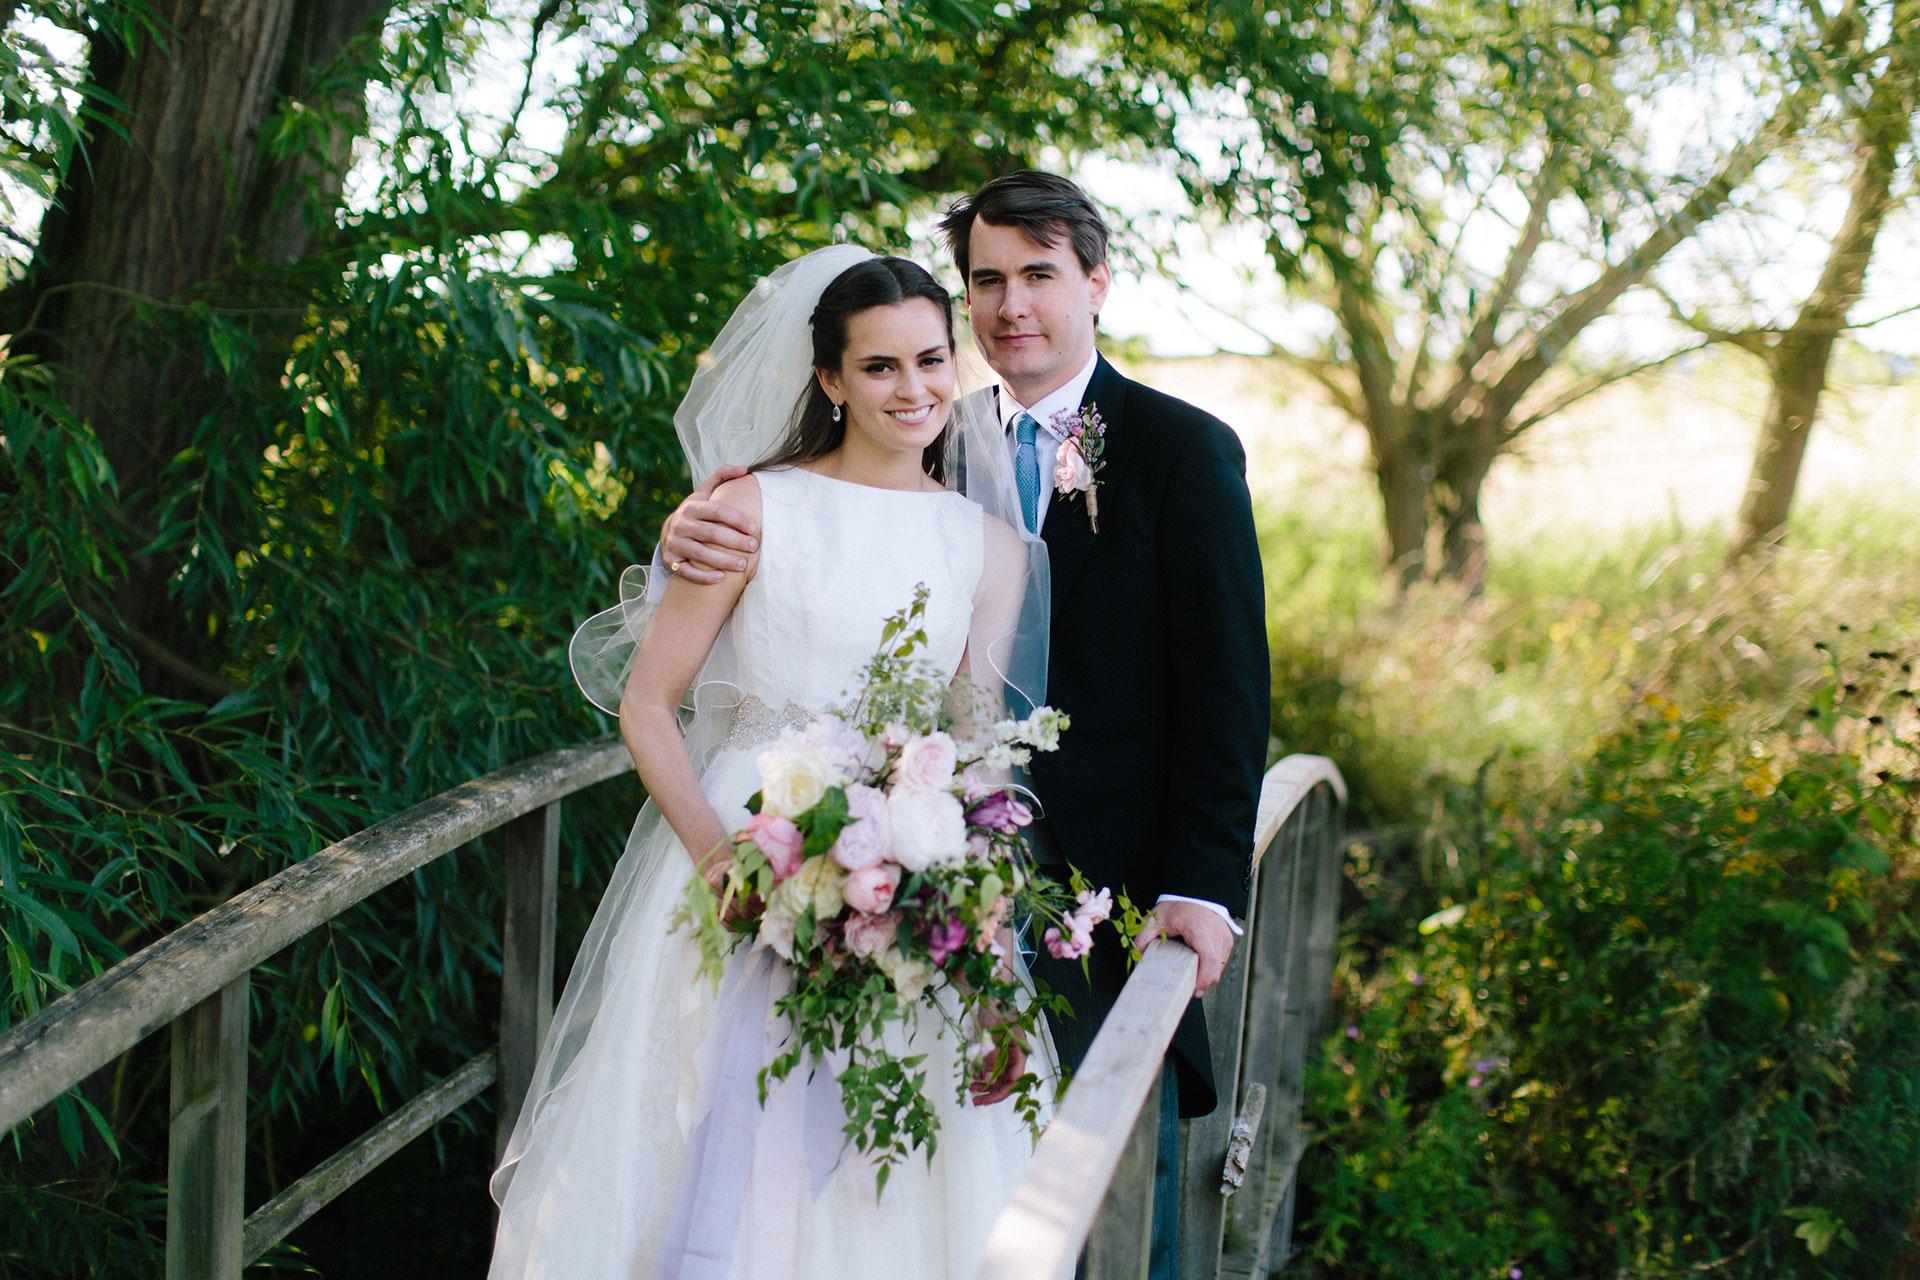 Langar-Hall-wedding-photographer-in-Nottinghamshire-Michael-Newington-Gray-65.jpg